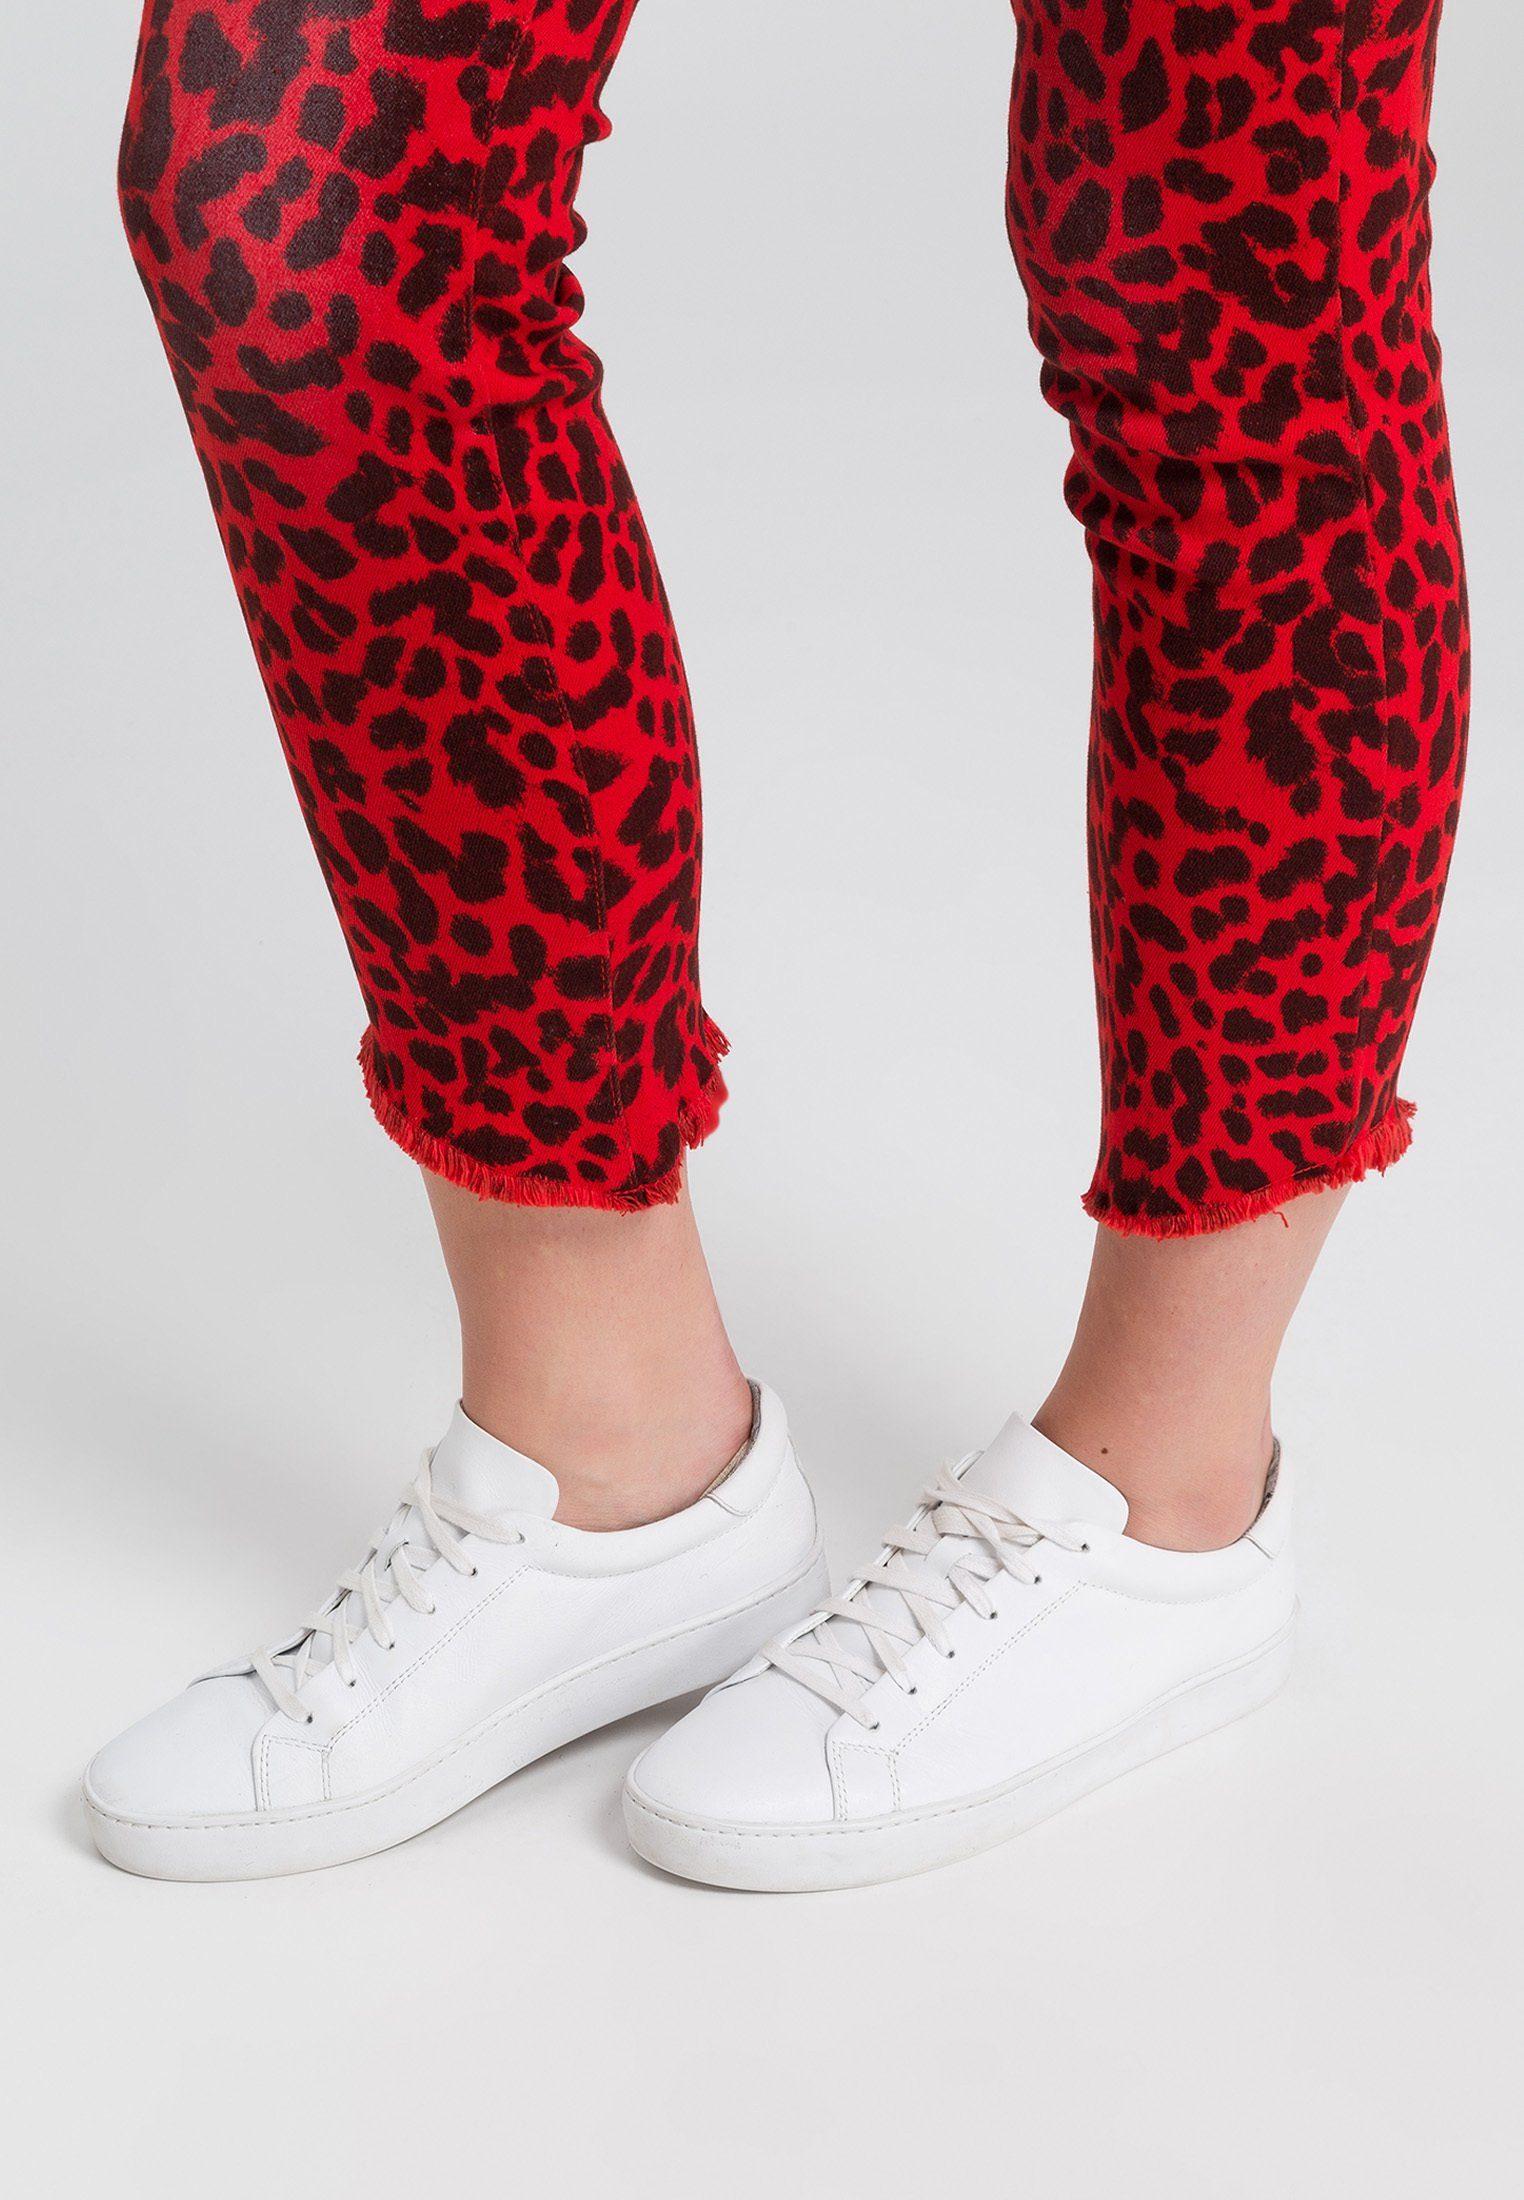 MARC AUREL 5-Pocket-Jeans mit Leopardendruck